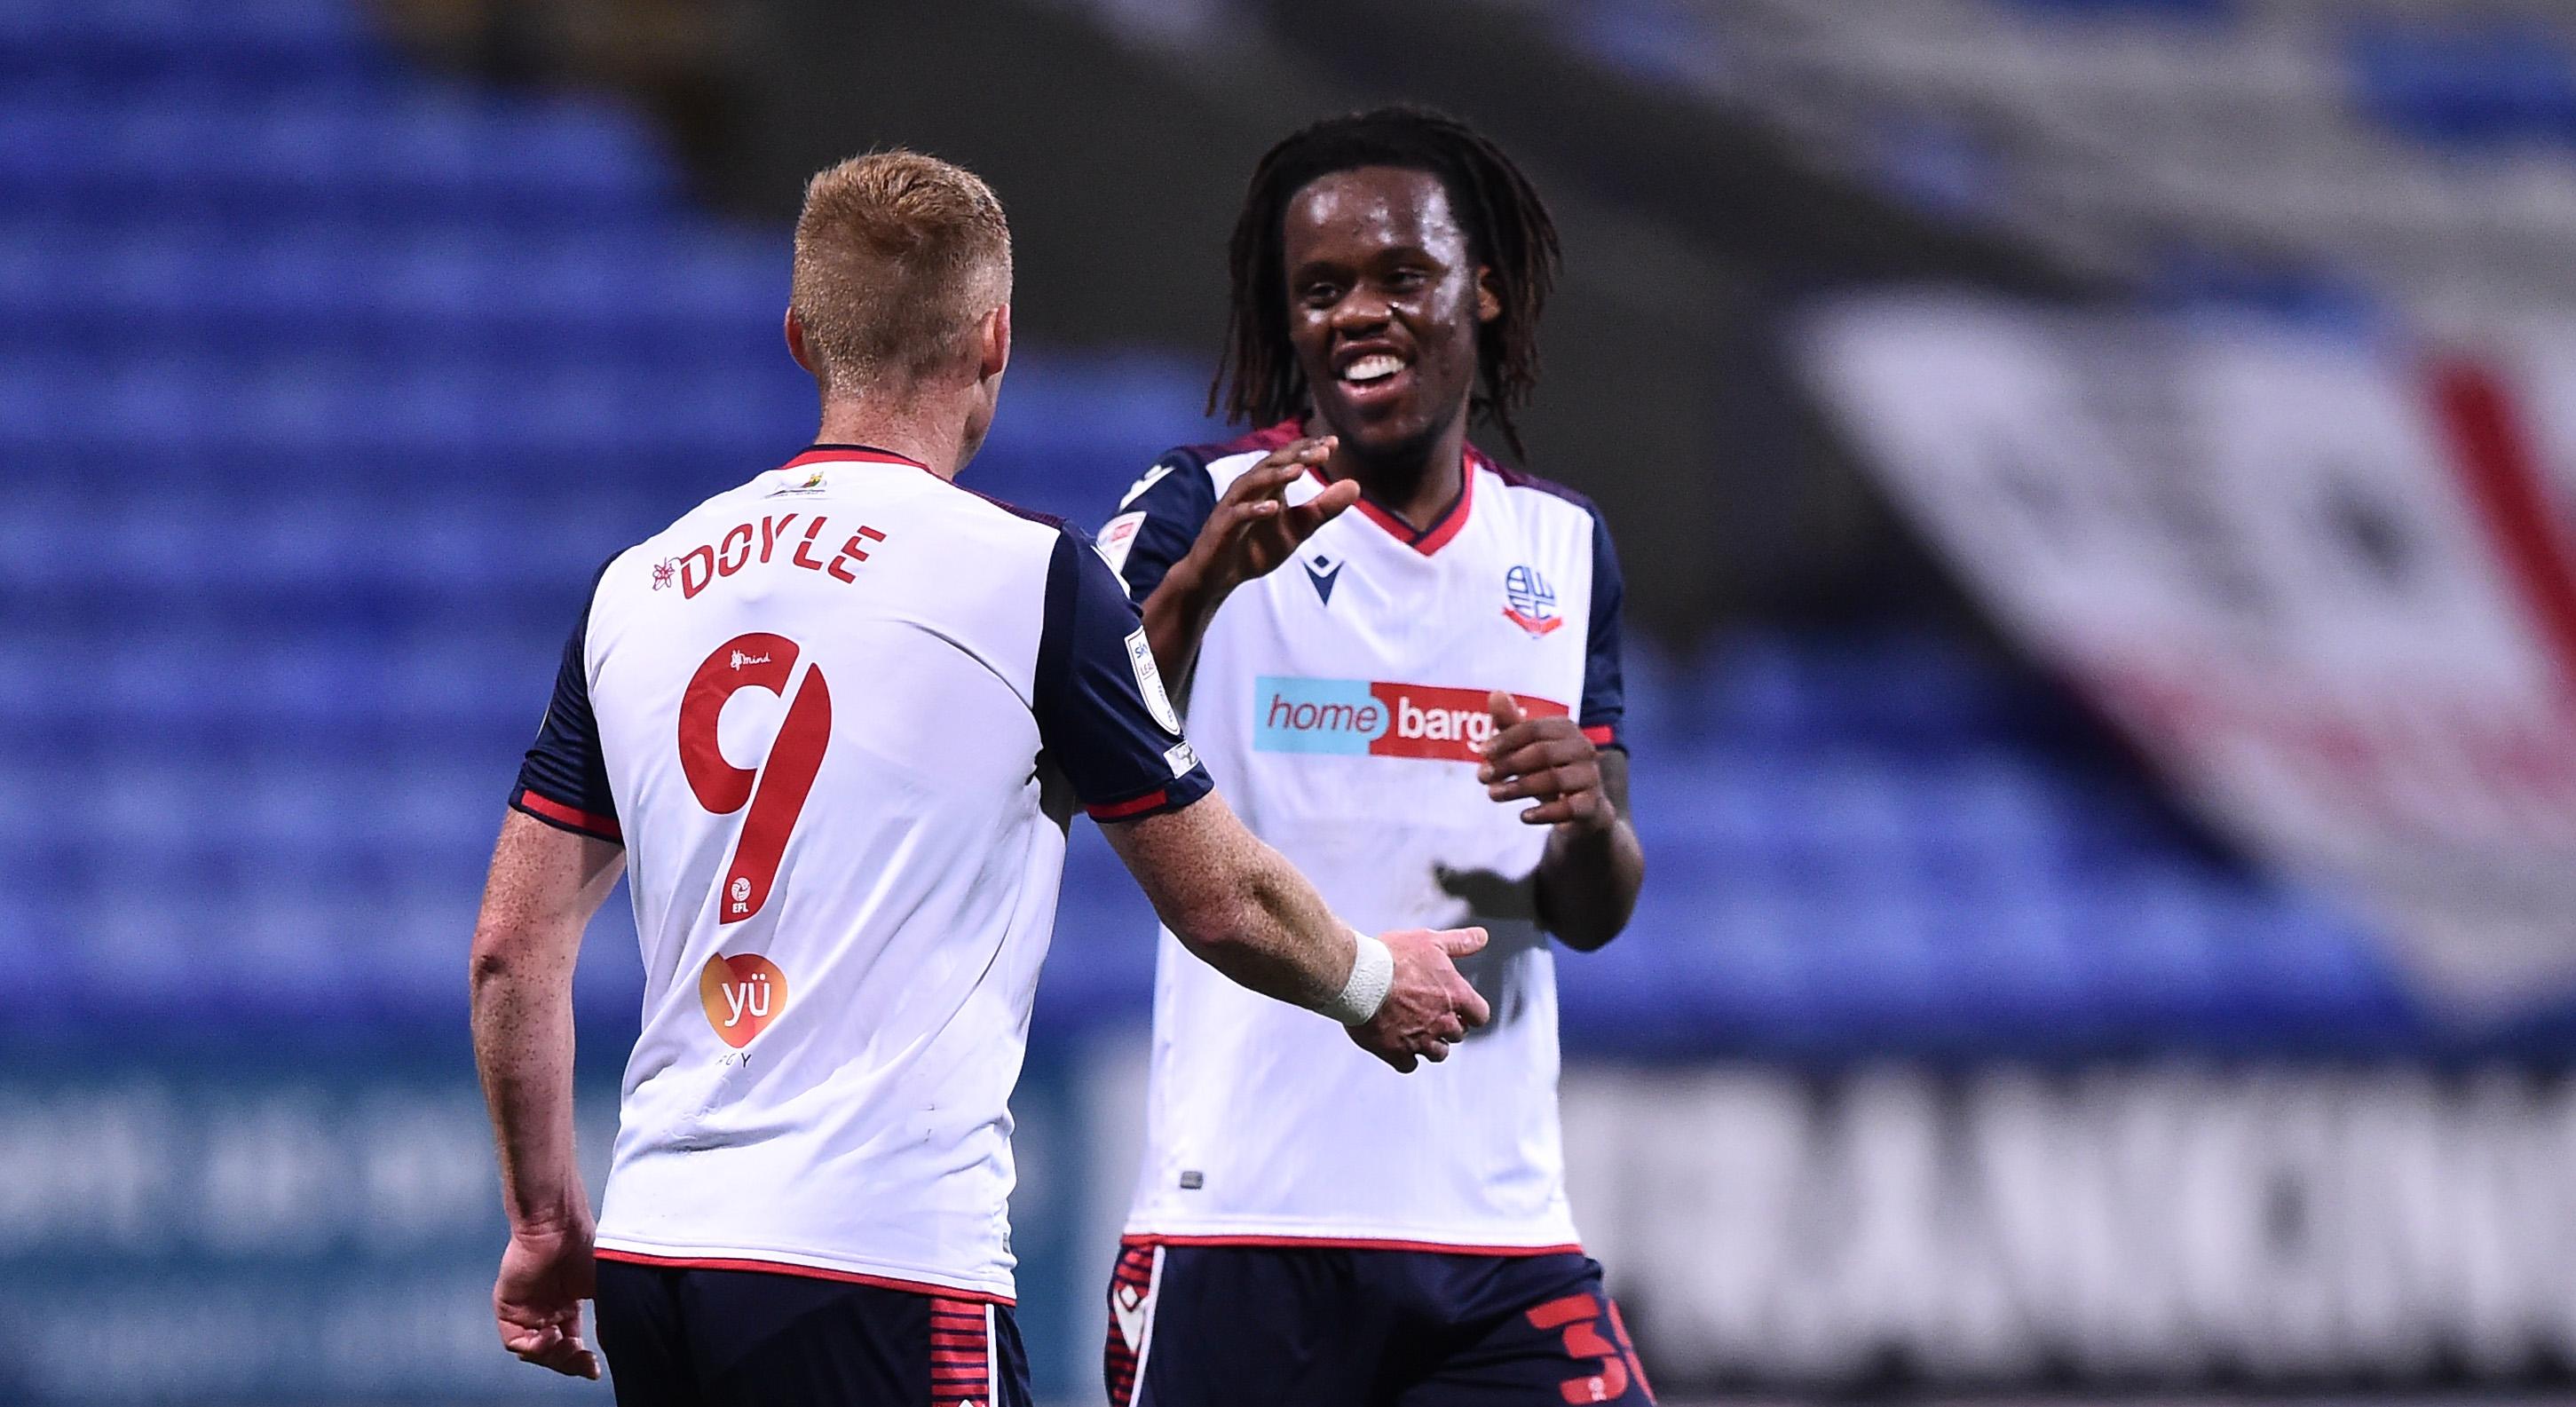 Bolton Wanderers v Salford City - Sky Bet League Two